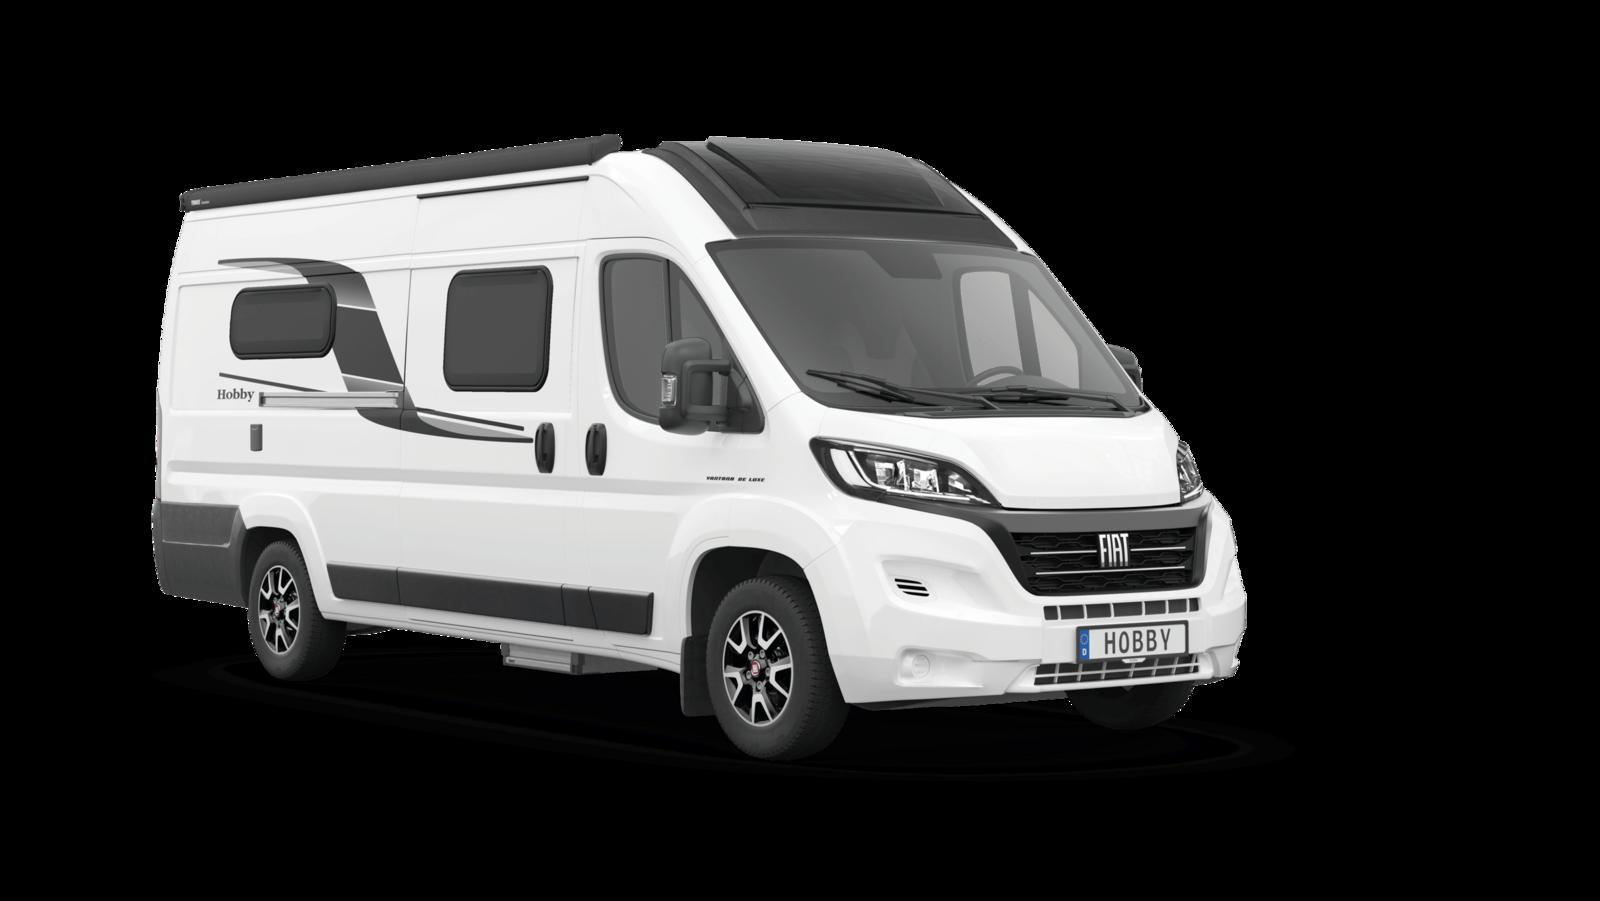 2022-KW-Freisteller-Bug-Vantana-De-Luxe-K65-ET-weiss-Rahmenfenster-PRESSE-lowres